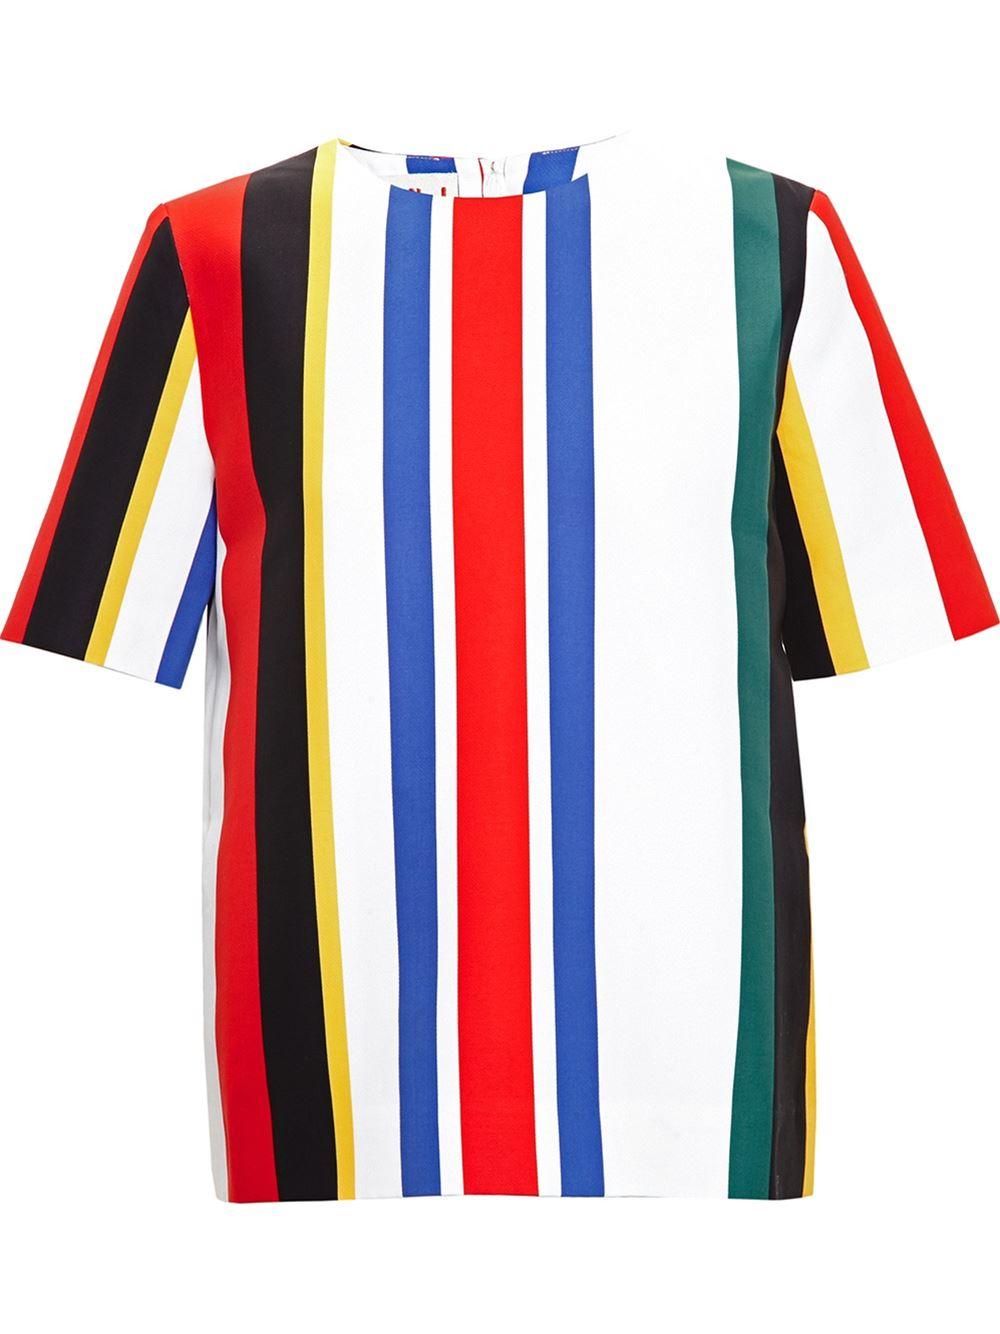 Marni candy striped top